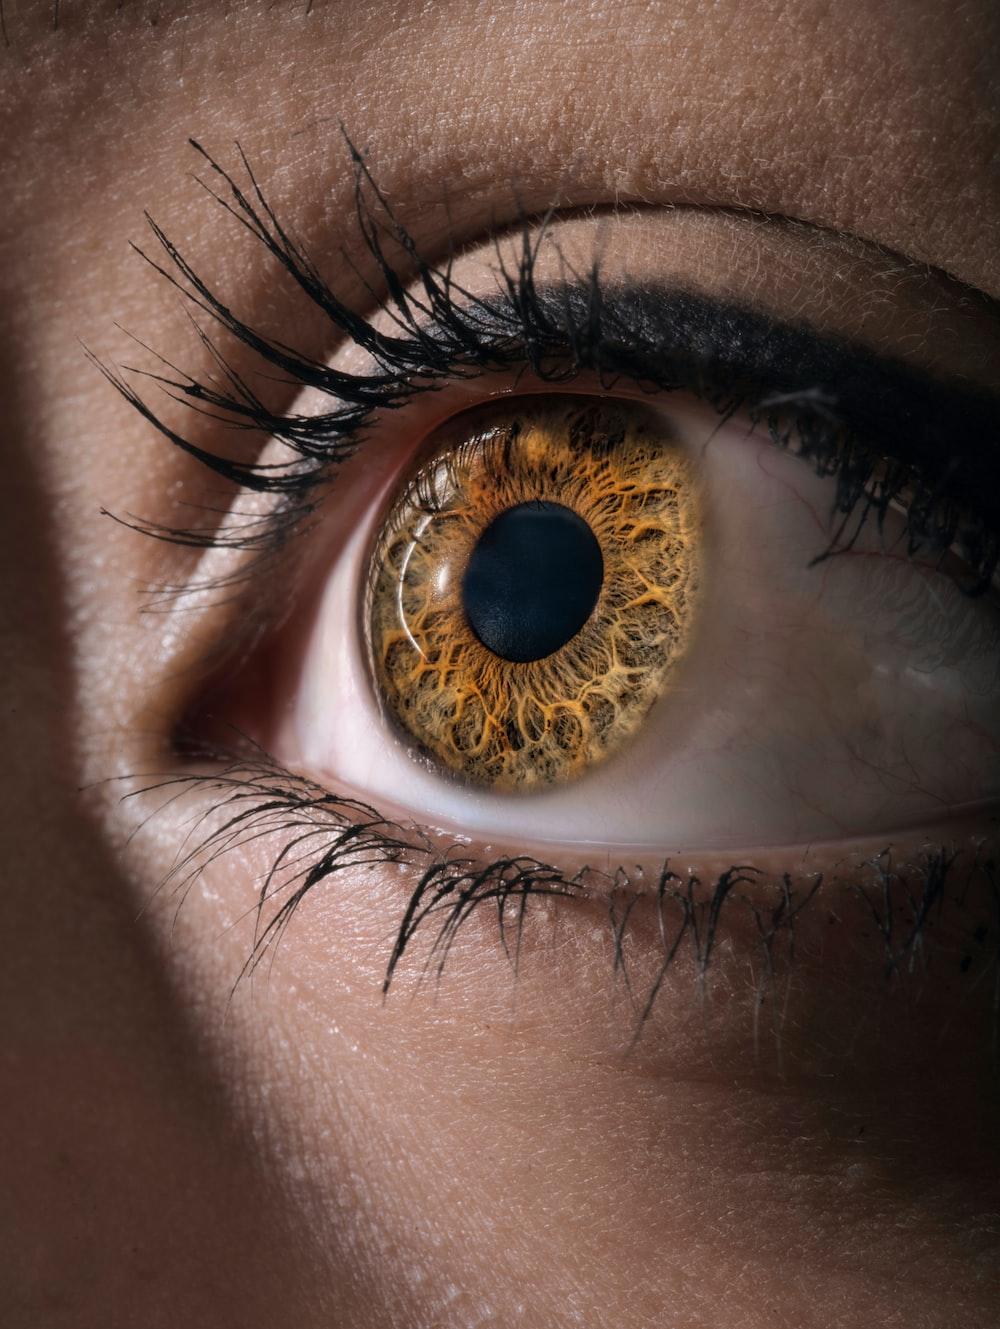 persons brown eyes with brown eyes